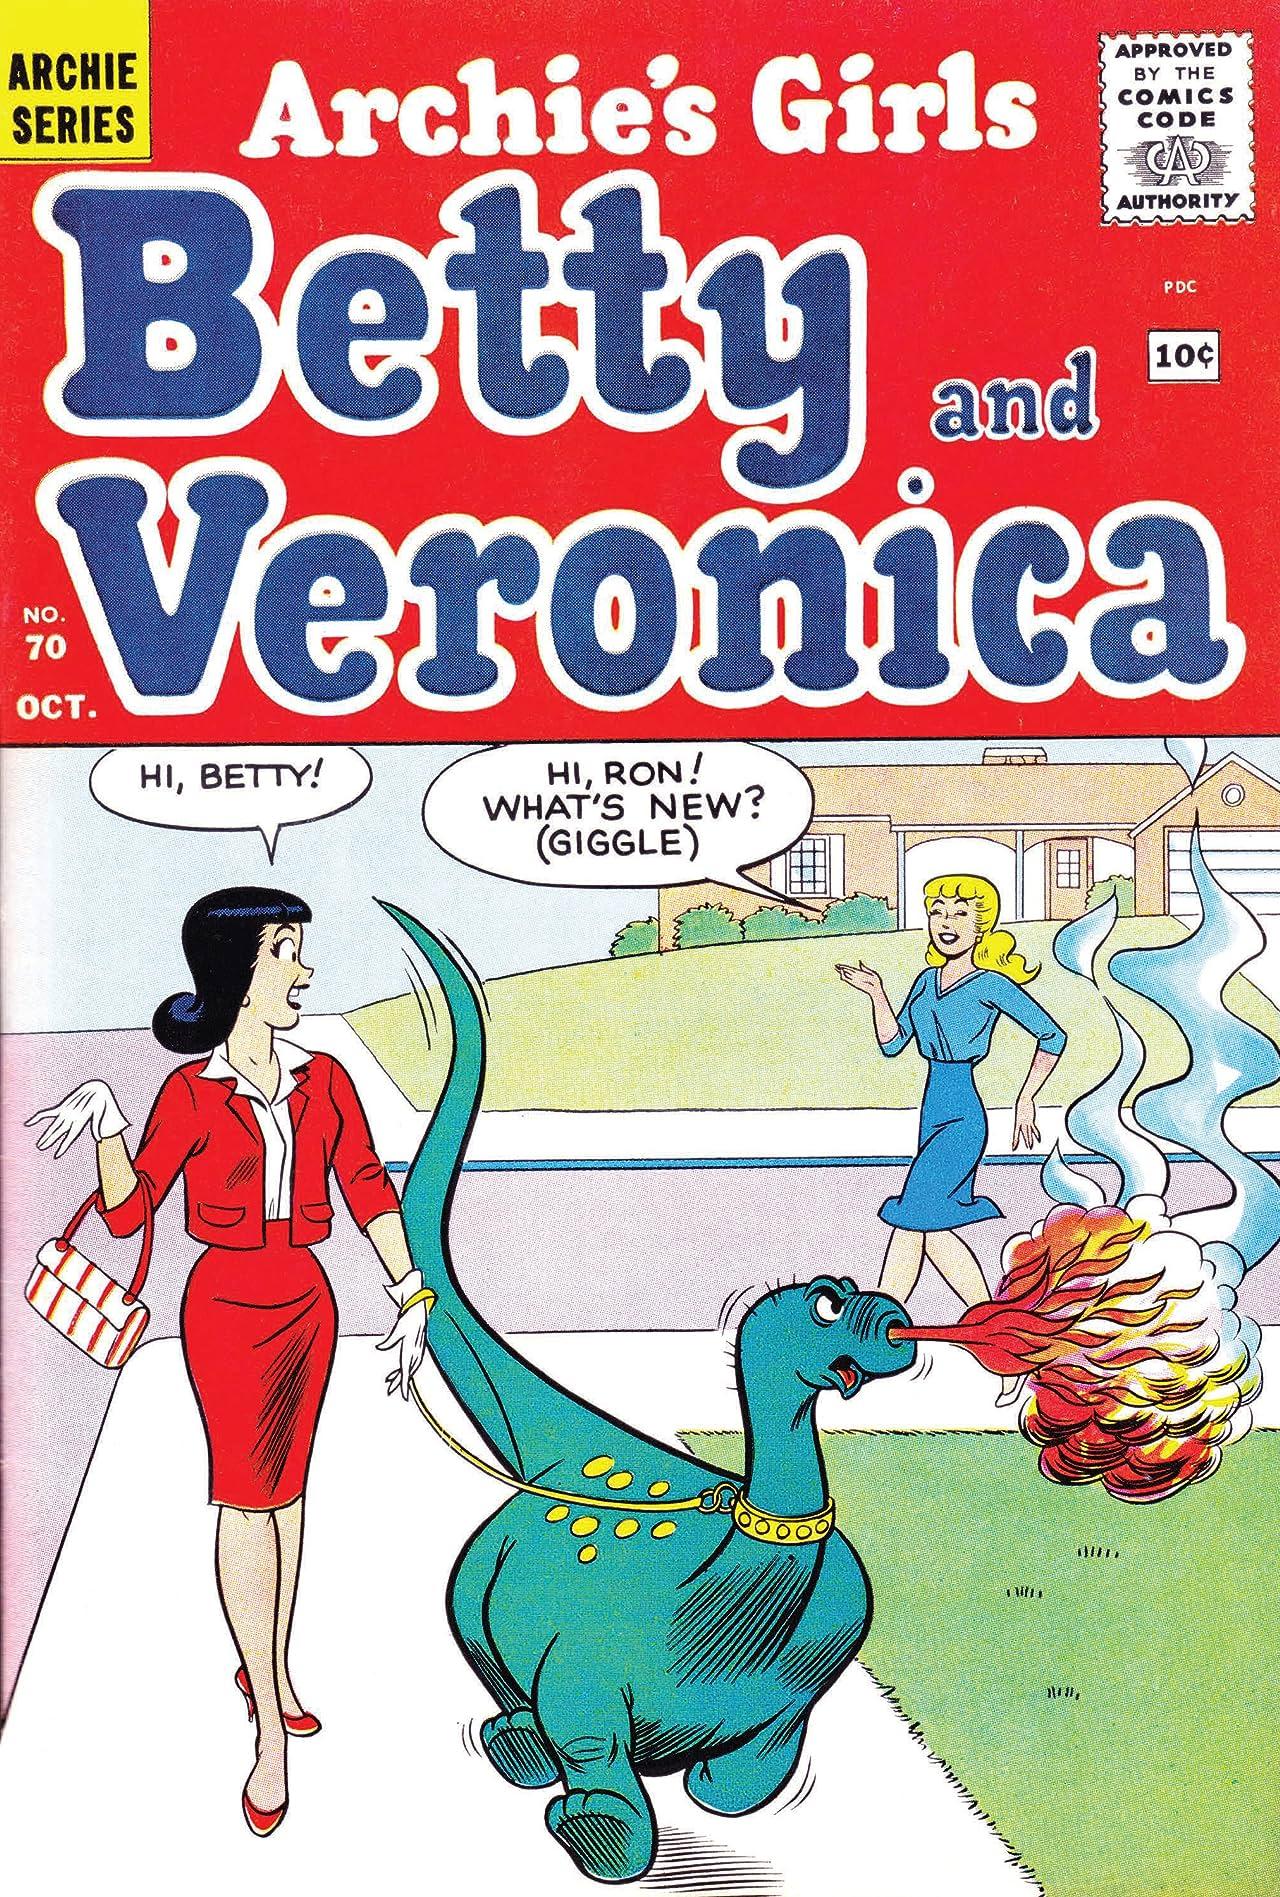 Archie's Girls Betty & Veronica #70